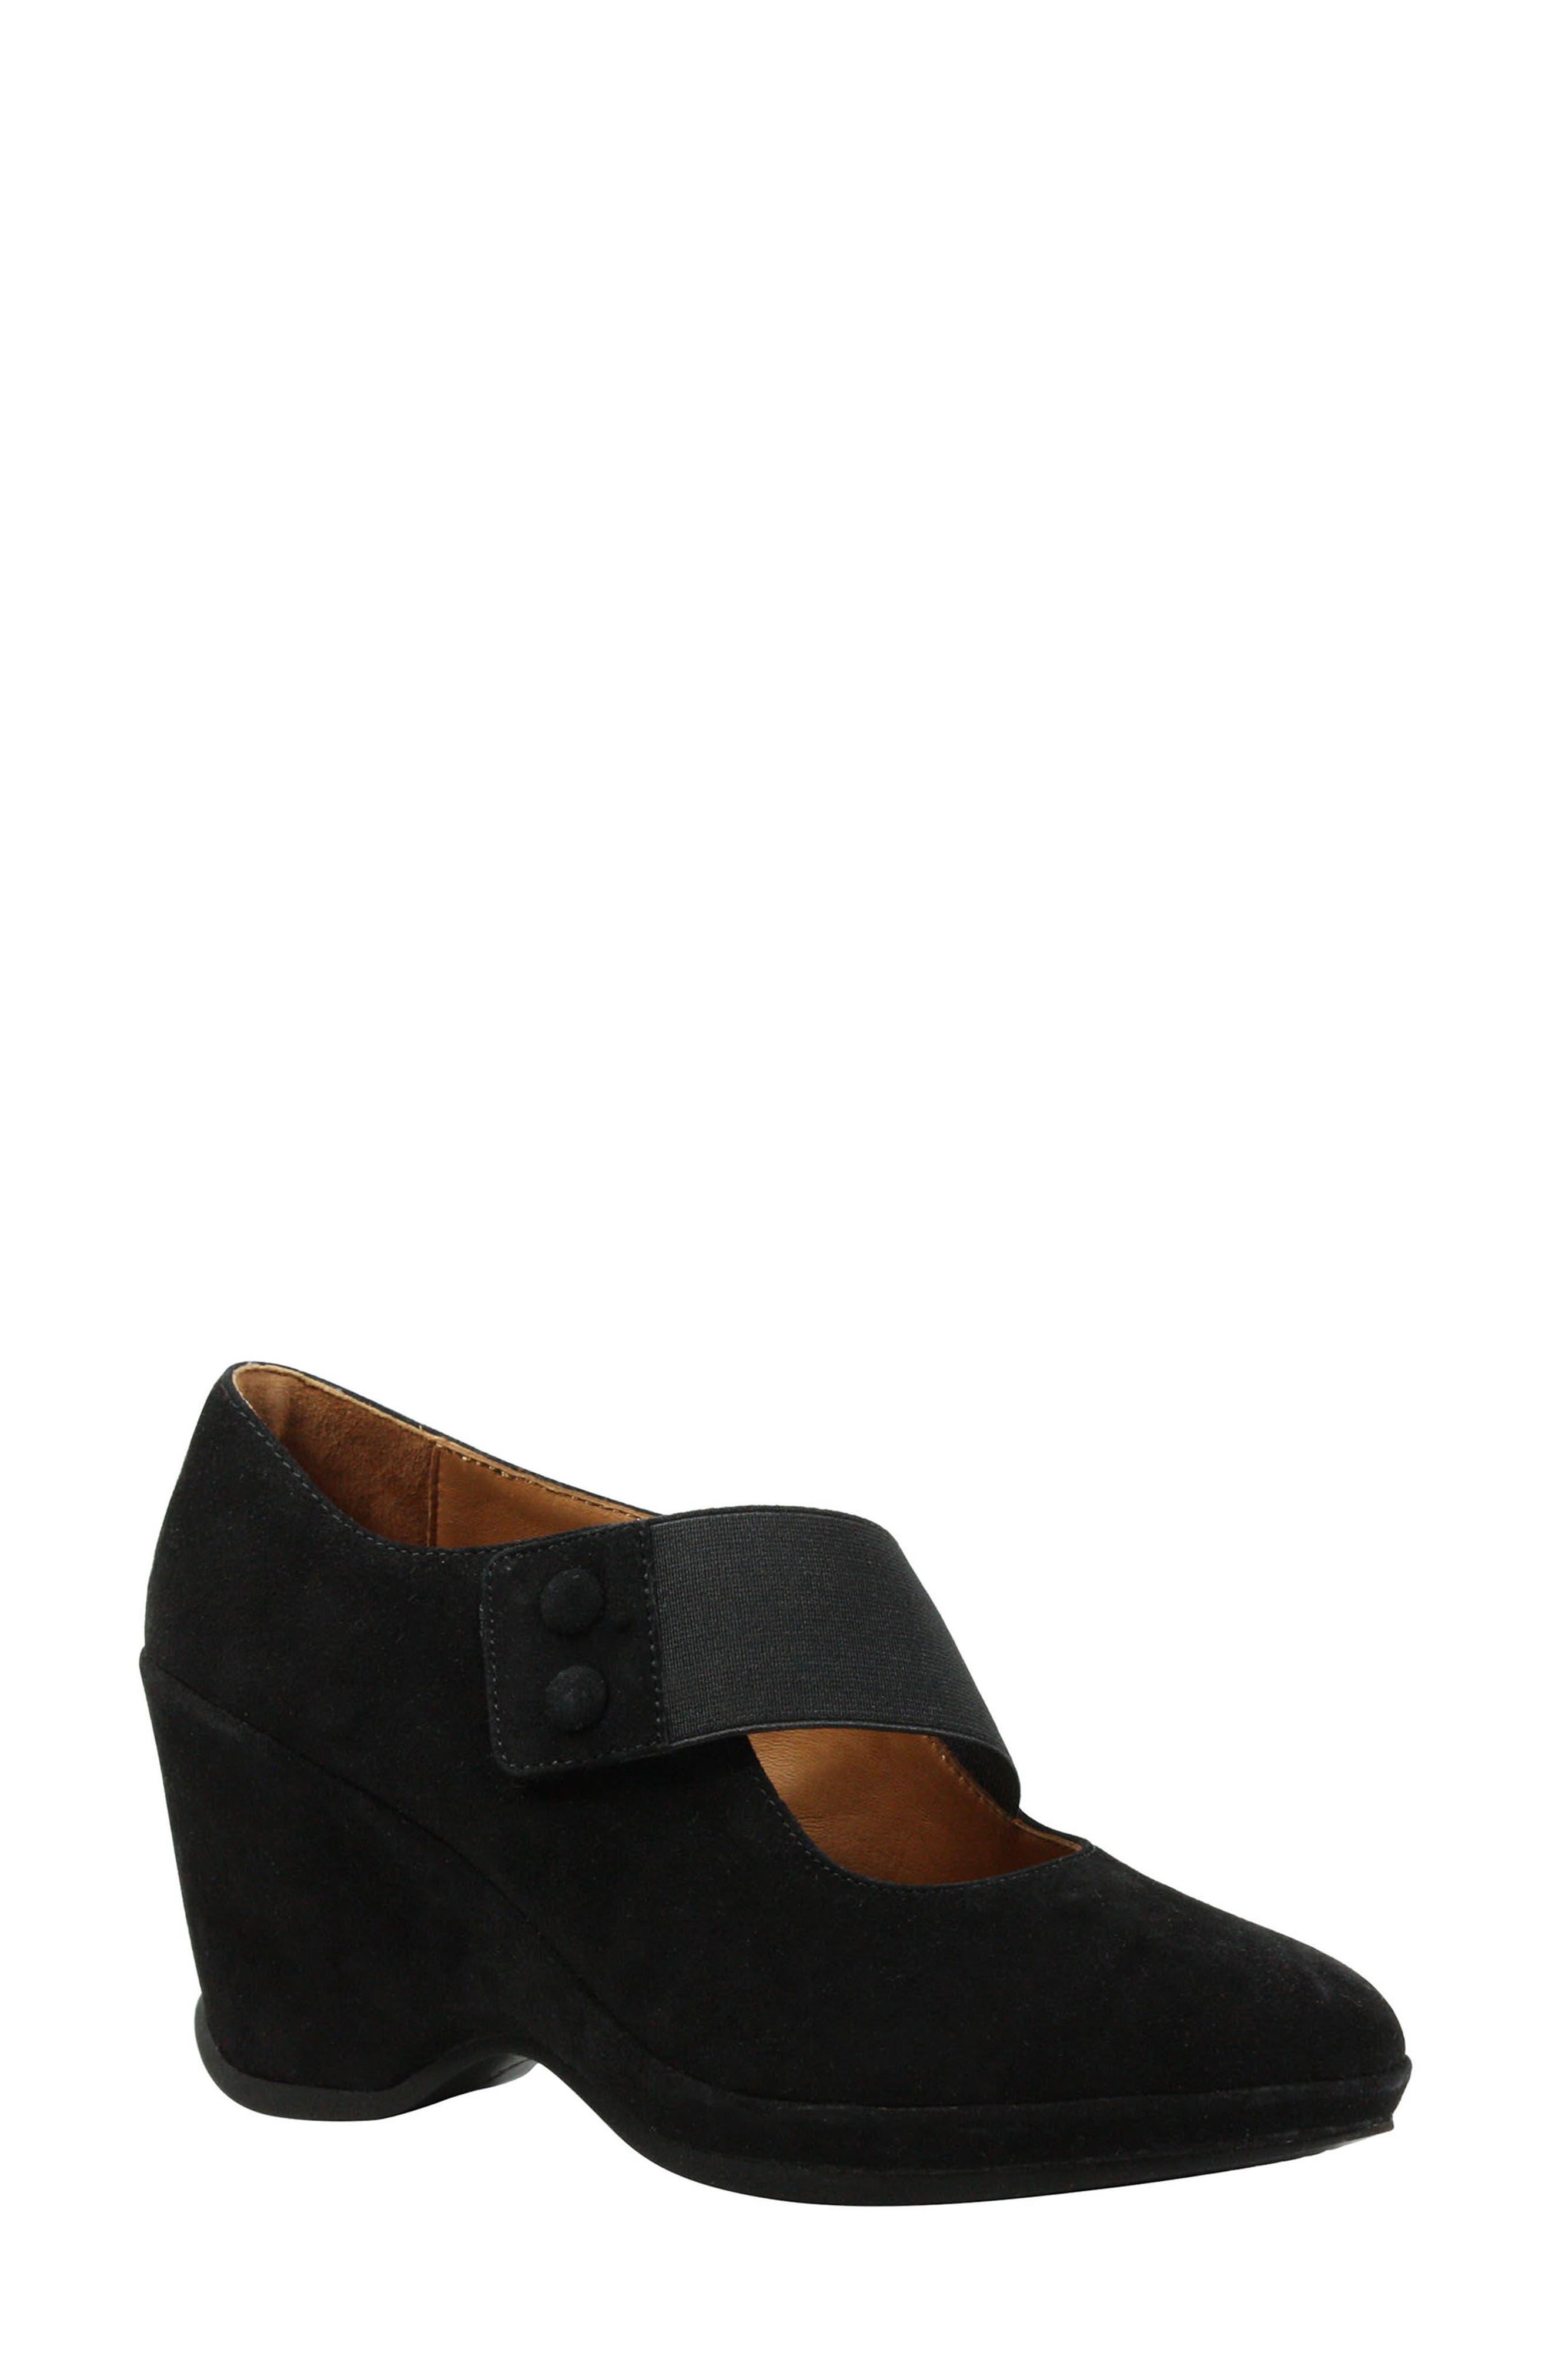 Oriana Wedge,                         Main,                         color, Black Suede